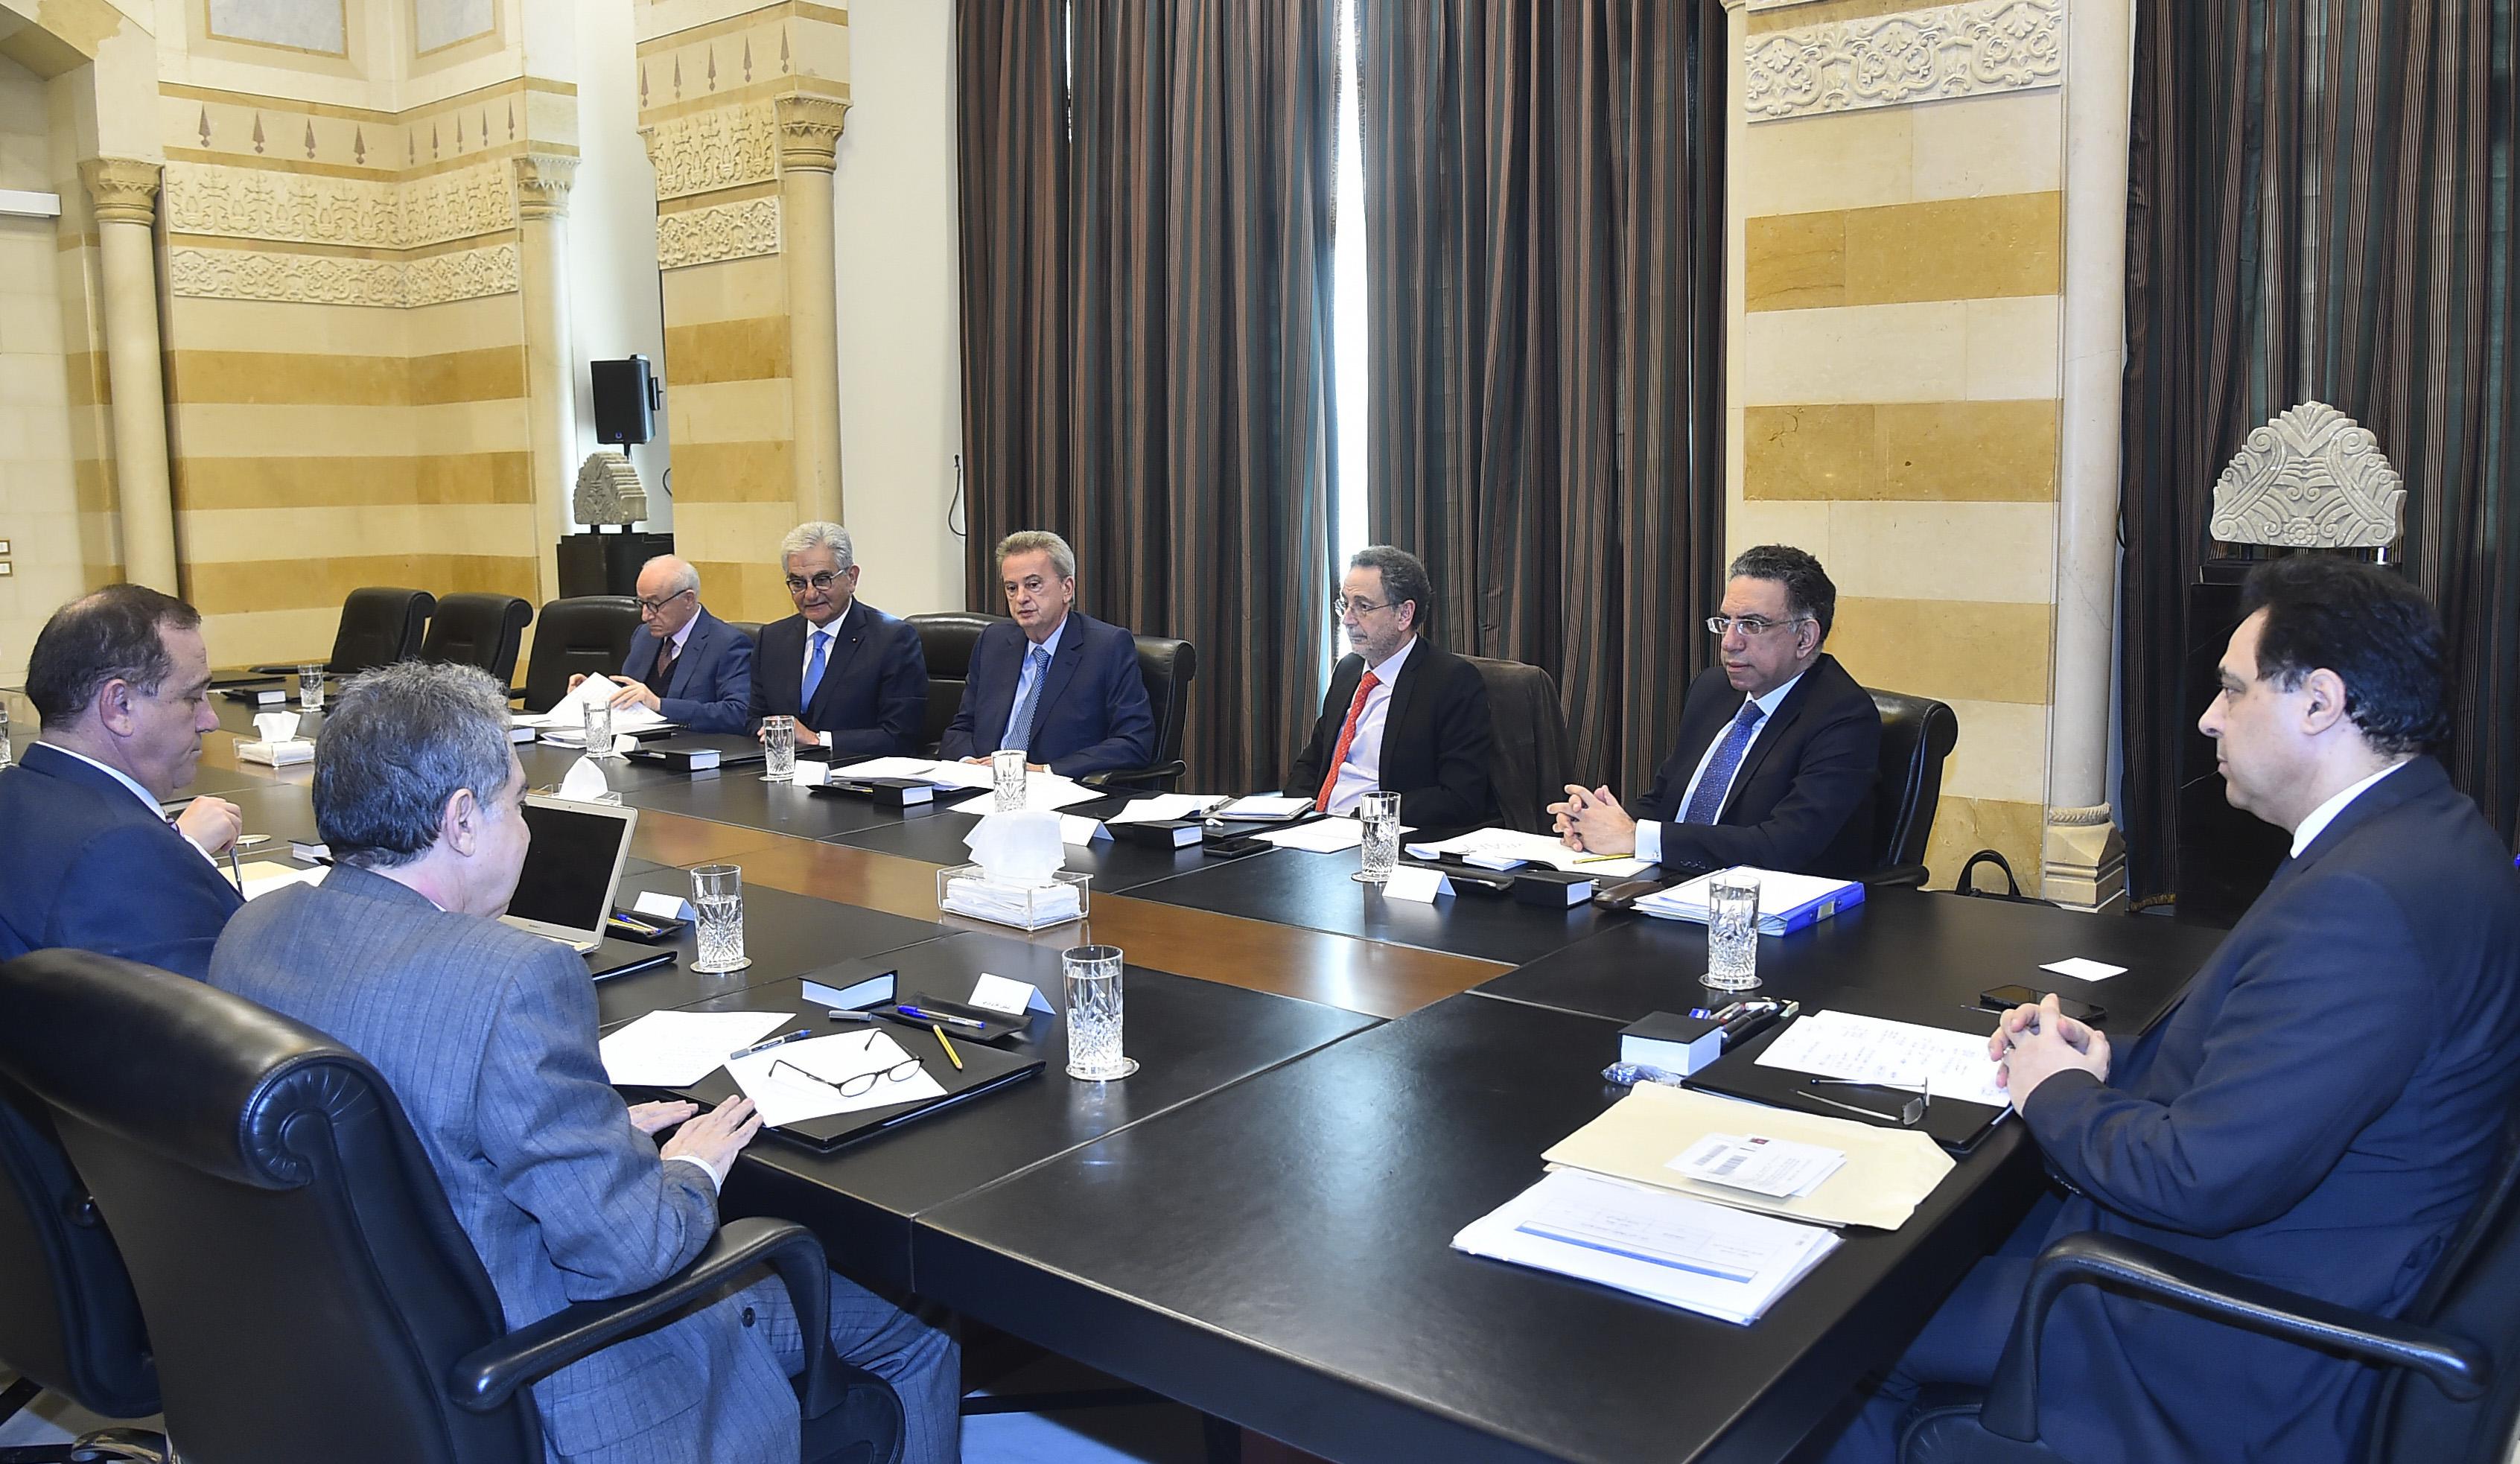 Pr Minister Hassan Diab meets Heading a Economics Meeting 1